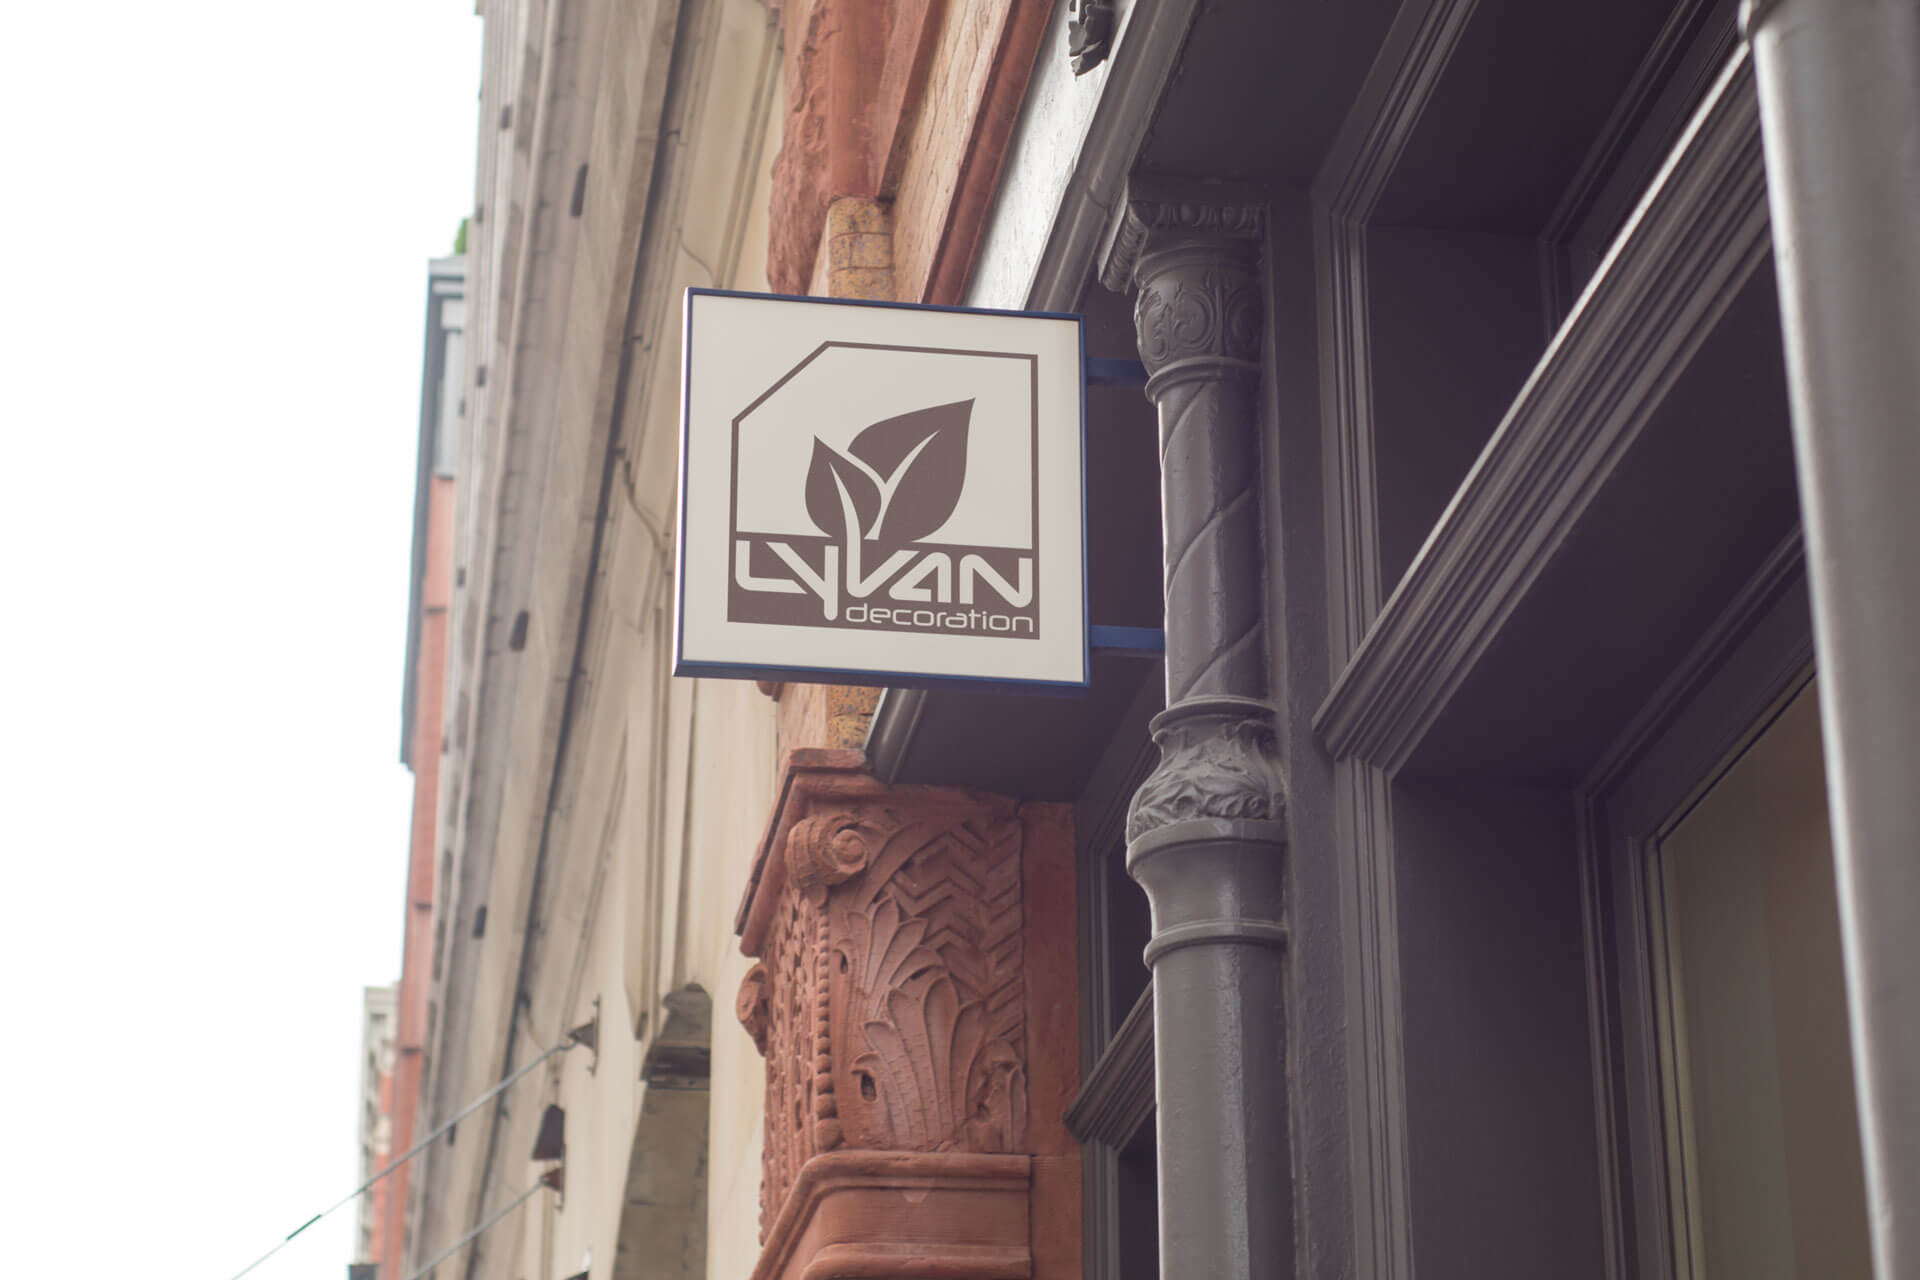 LyVan logo 1